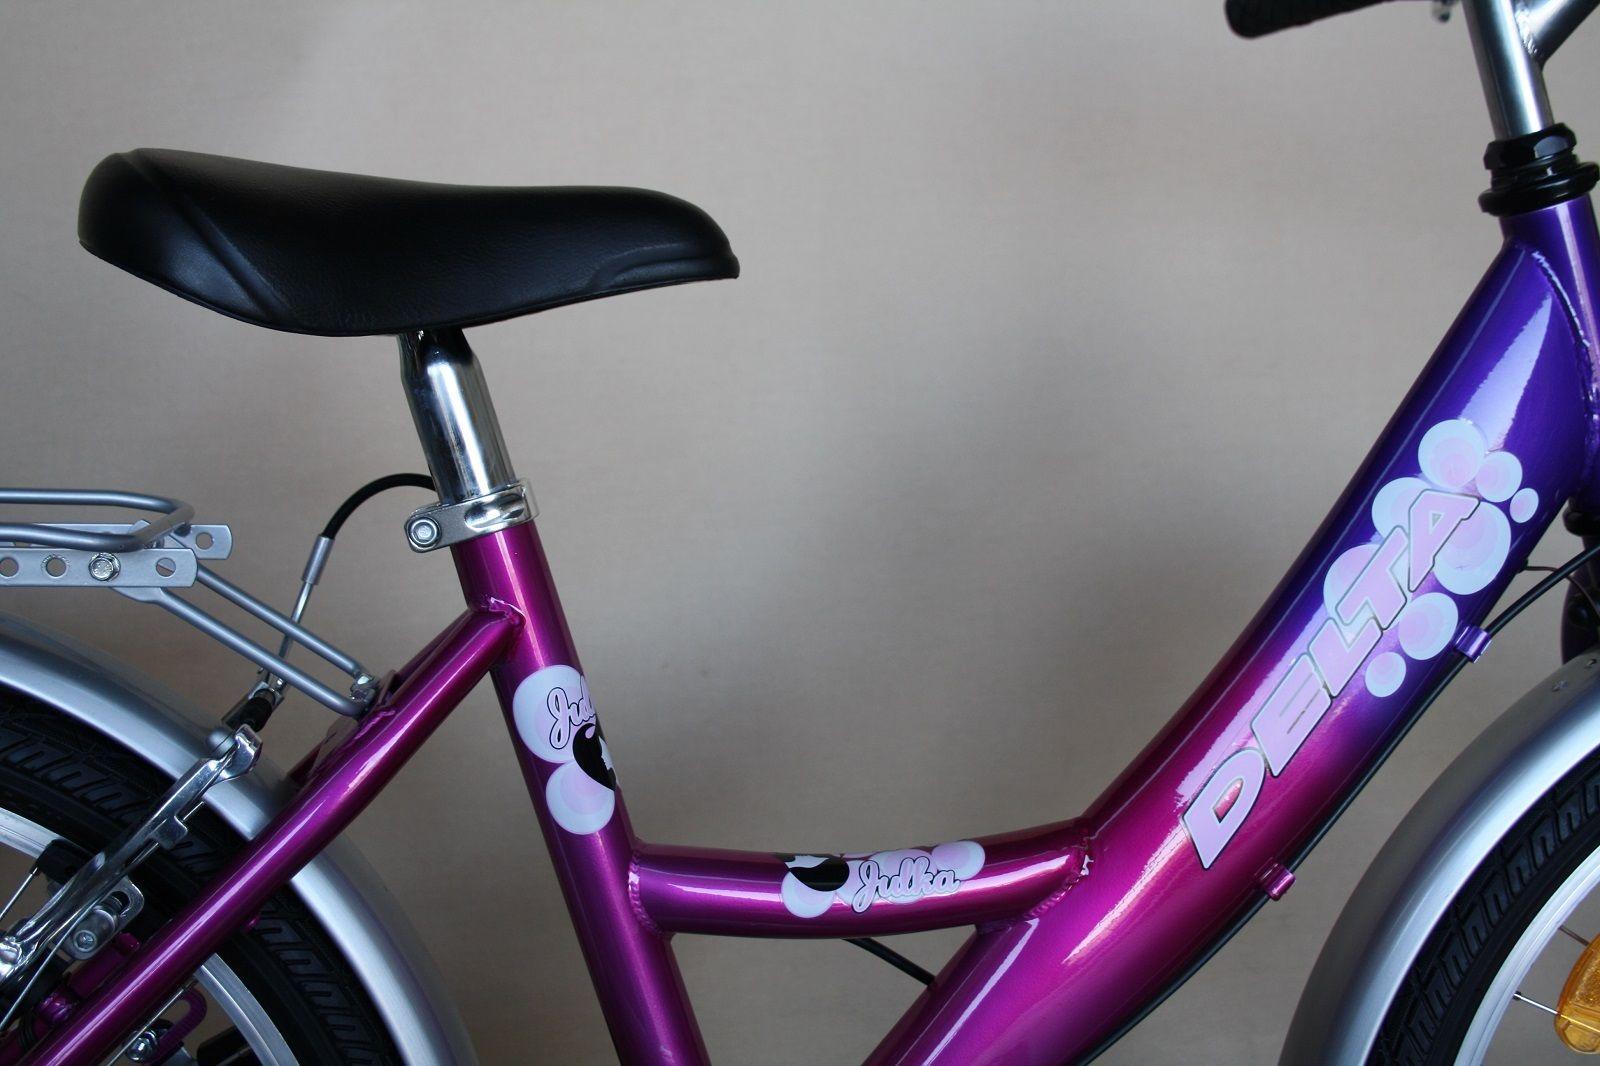 fahrrad m dchenfahrrad neu 20 zoll shimano 6 gang lila pink licht stvo ebay. Black Bedroom Furniture Sets. Home Design Ideas